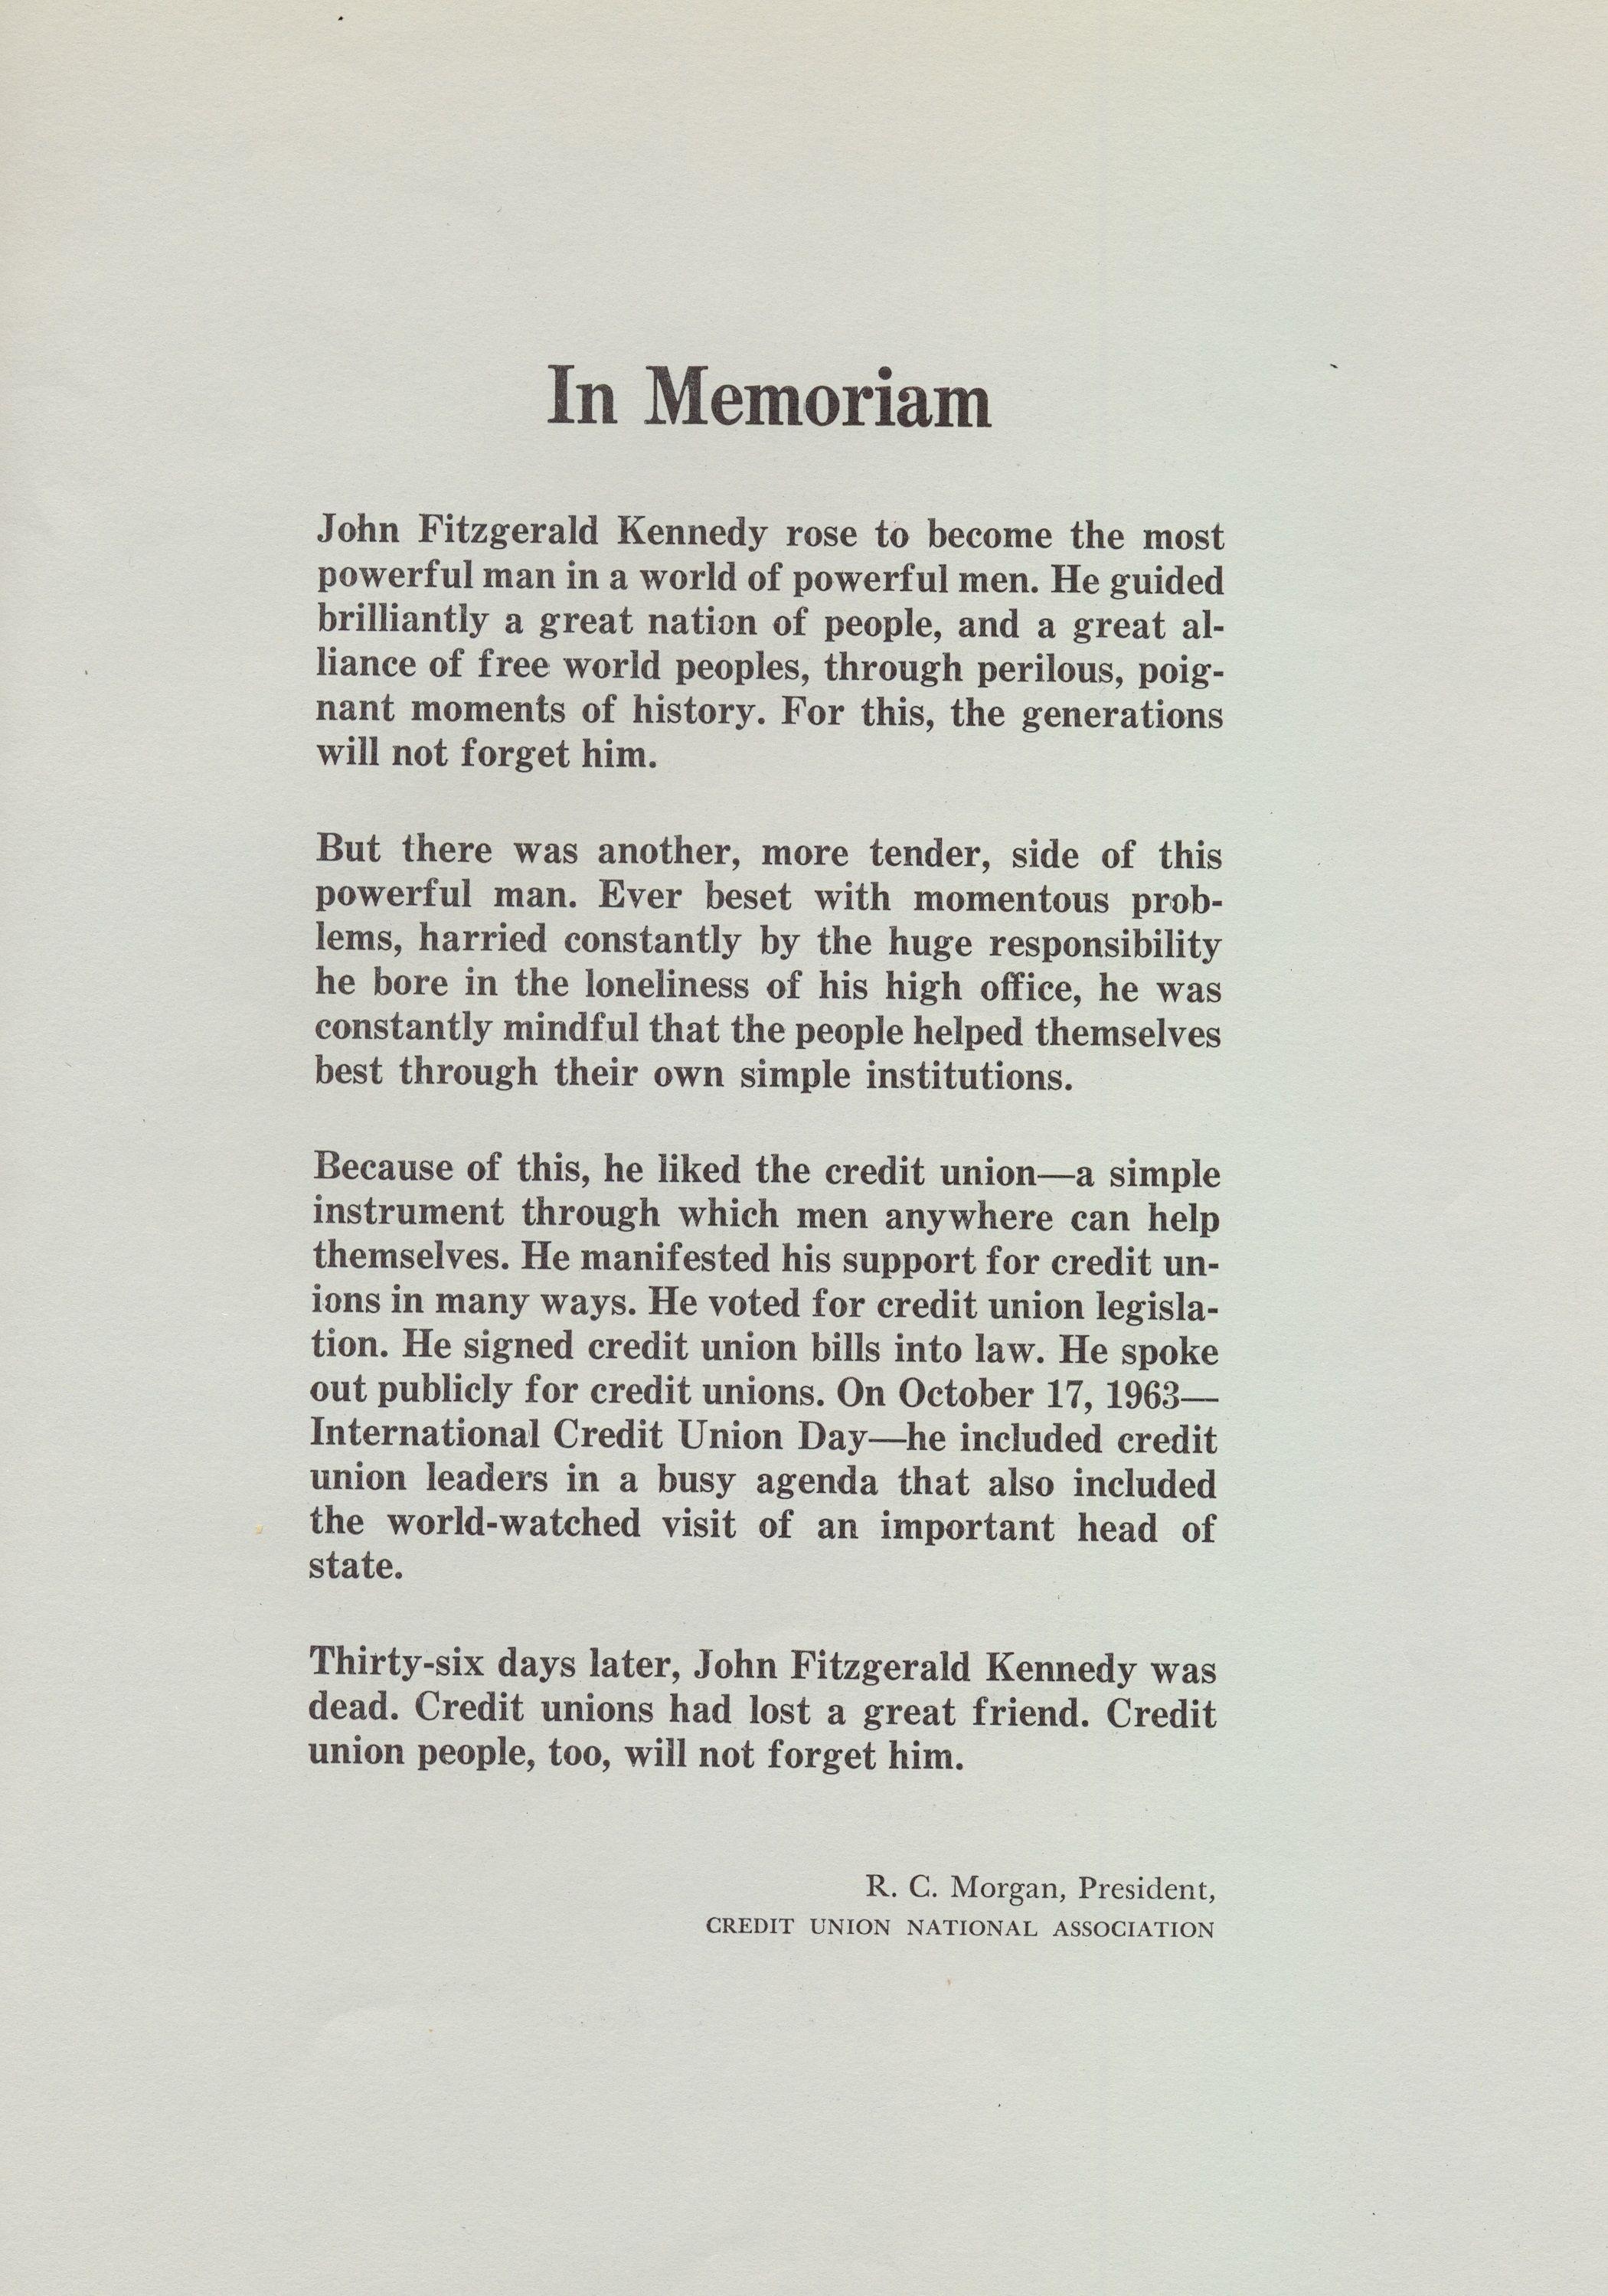 In Memoriam - John F. Kennedy (In Memoriam, page 2), Credit Union Magazine, December 1963.